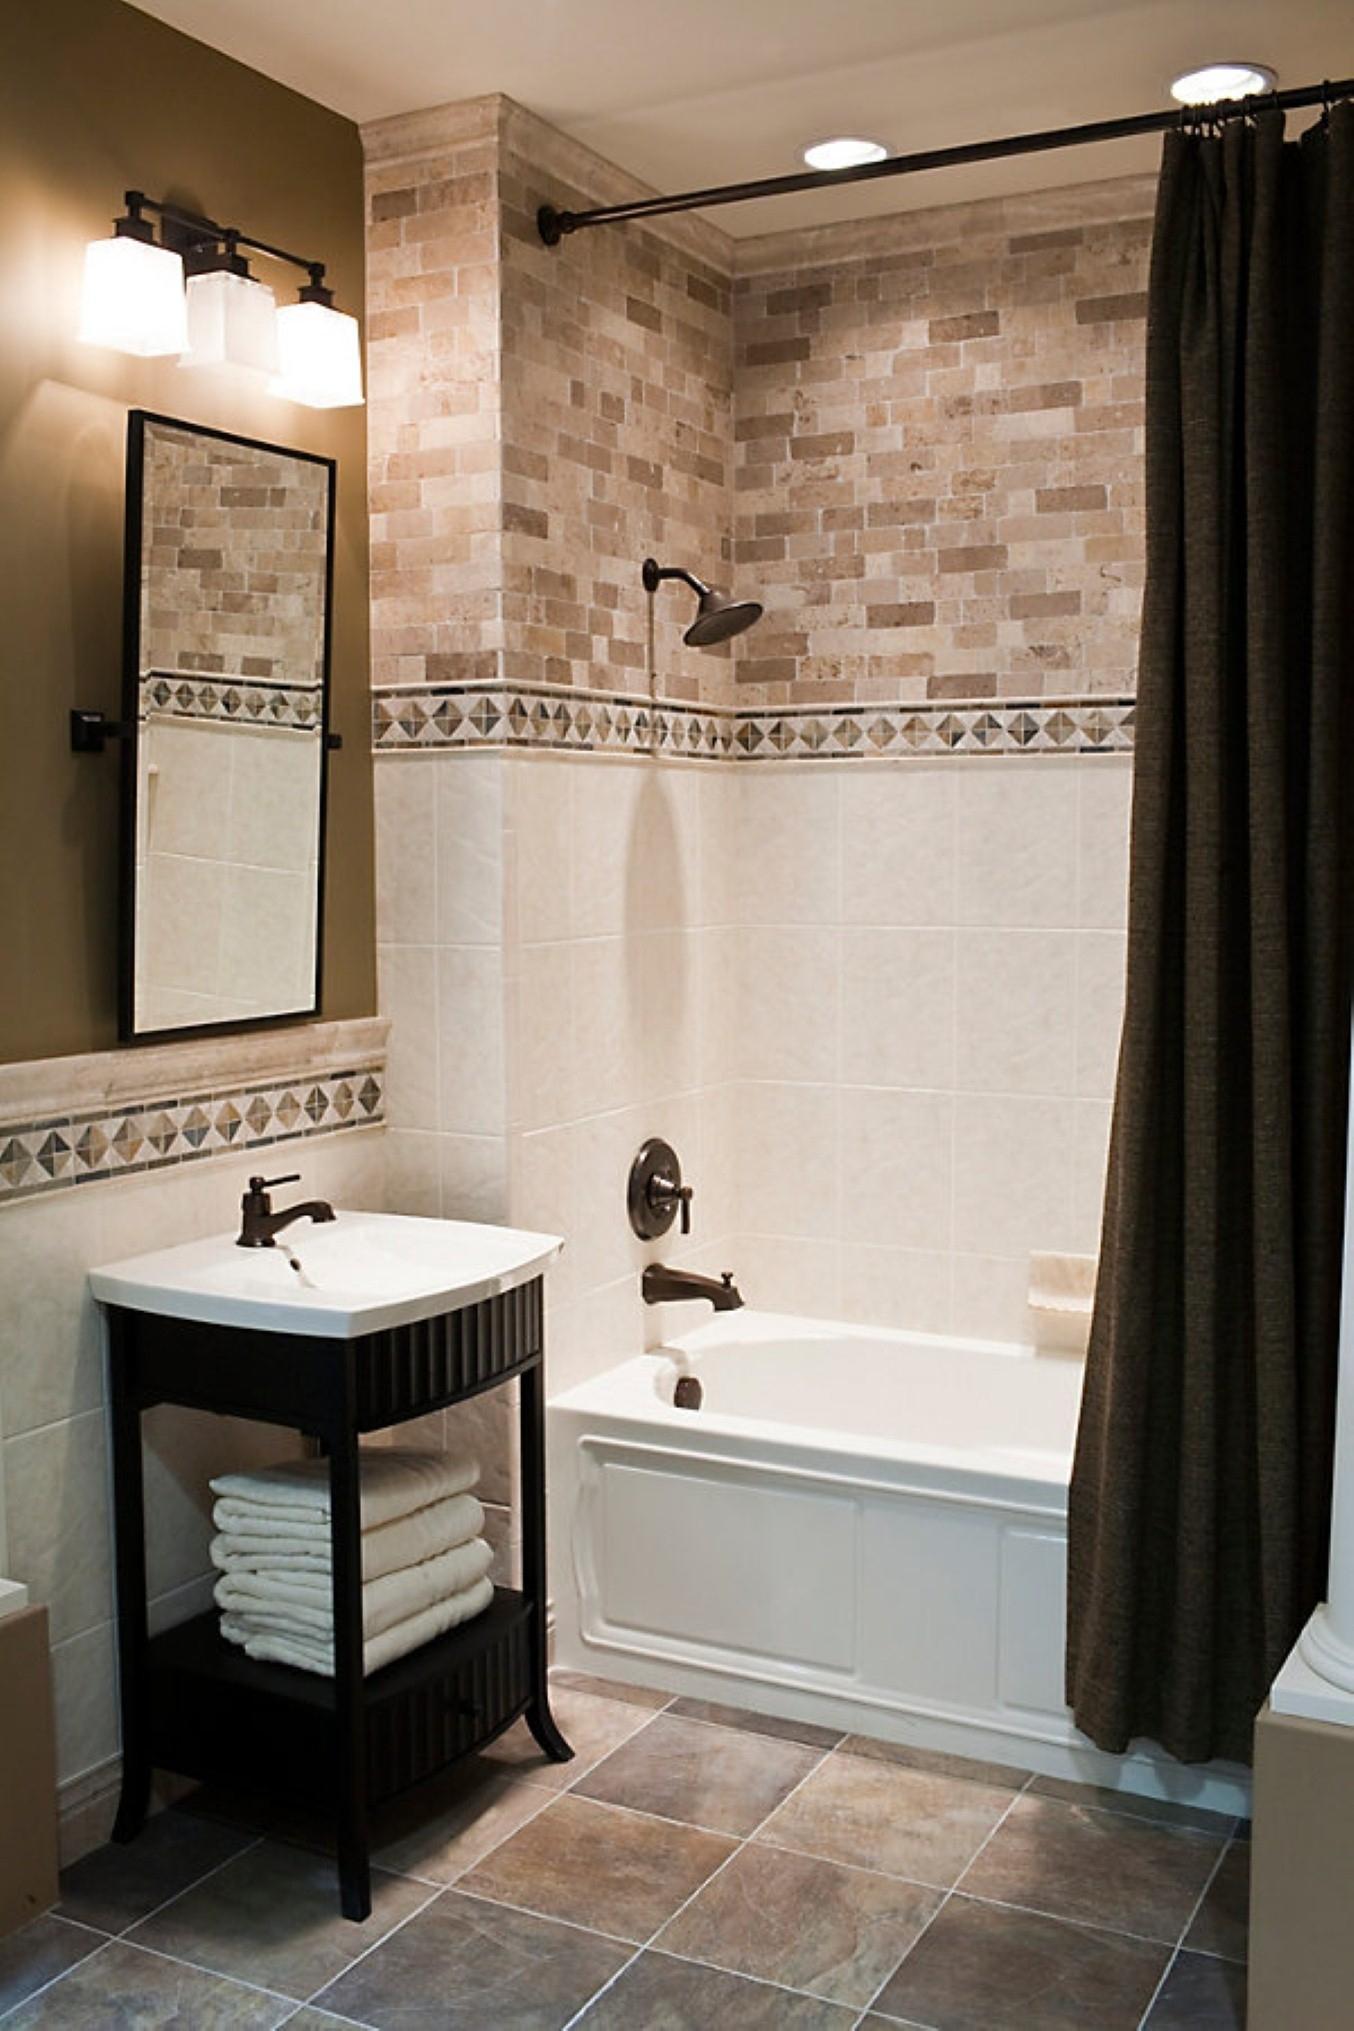 Stylish Bathroom Floor Tile Ideas As The Artistic Ideas The Inspiration Room To Renovation Bathroom You (Image 5 of 23)